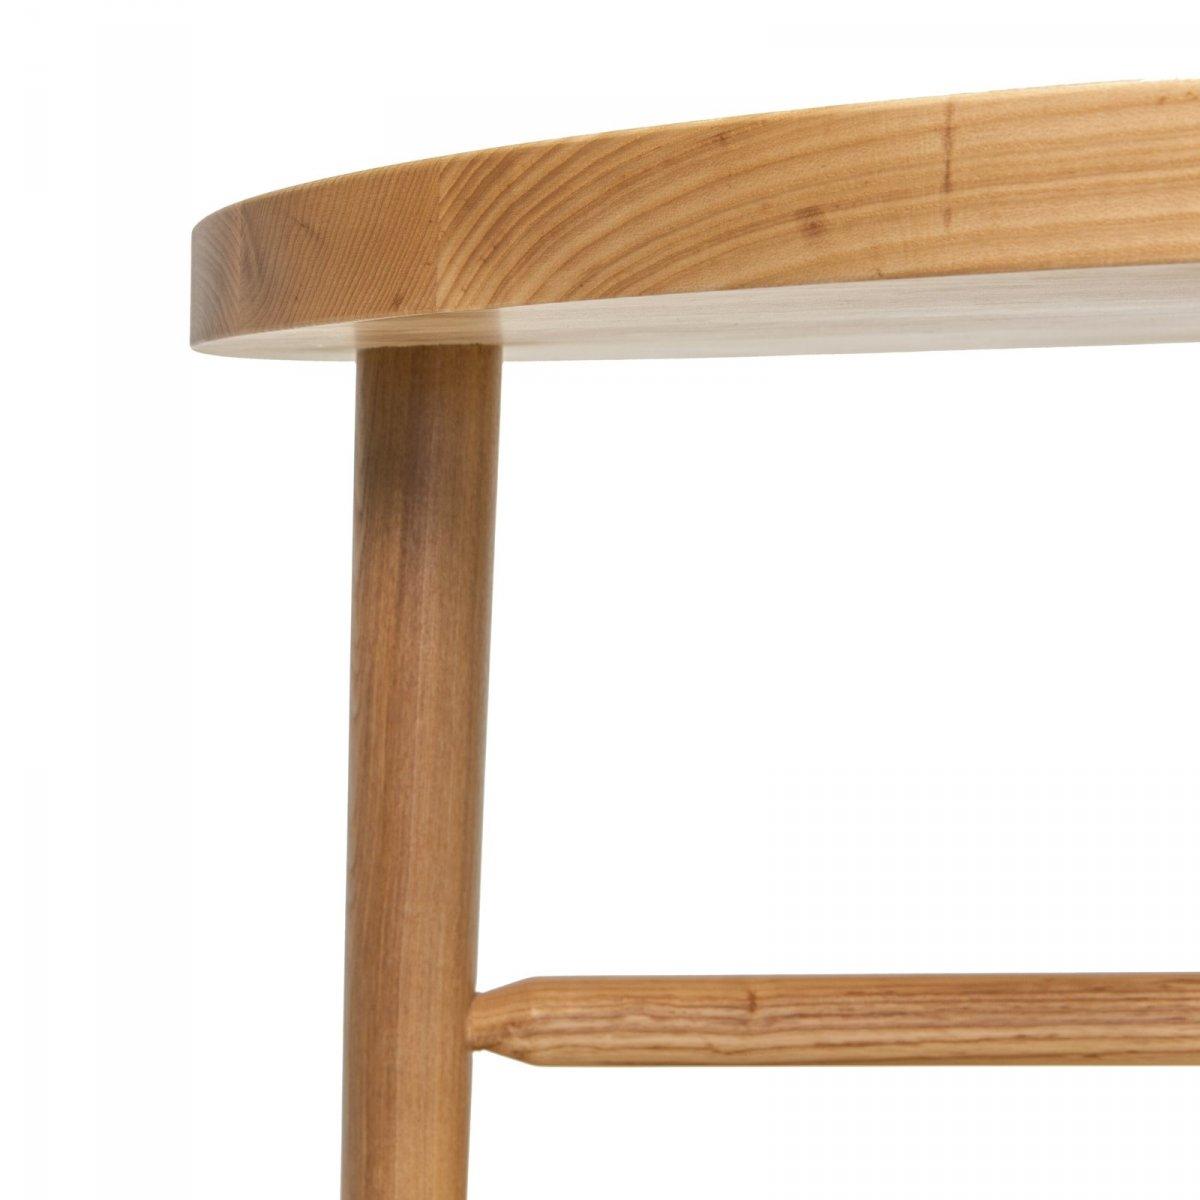 "LAXseries Milking Table 36"", detail."